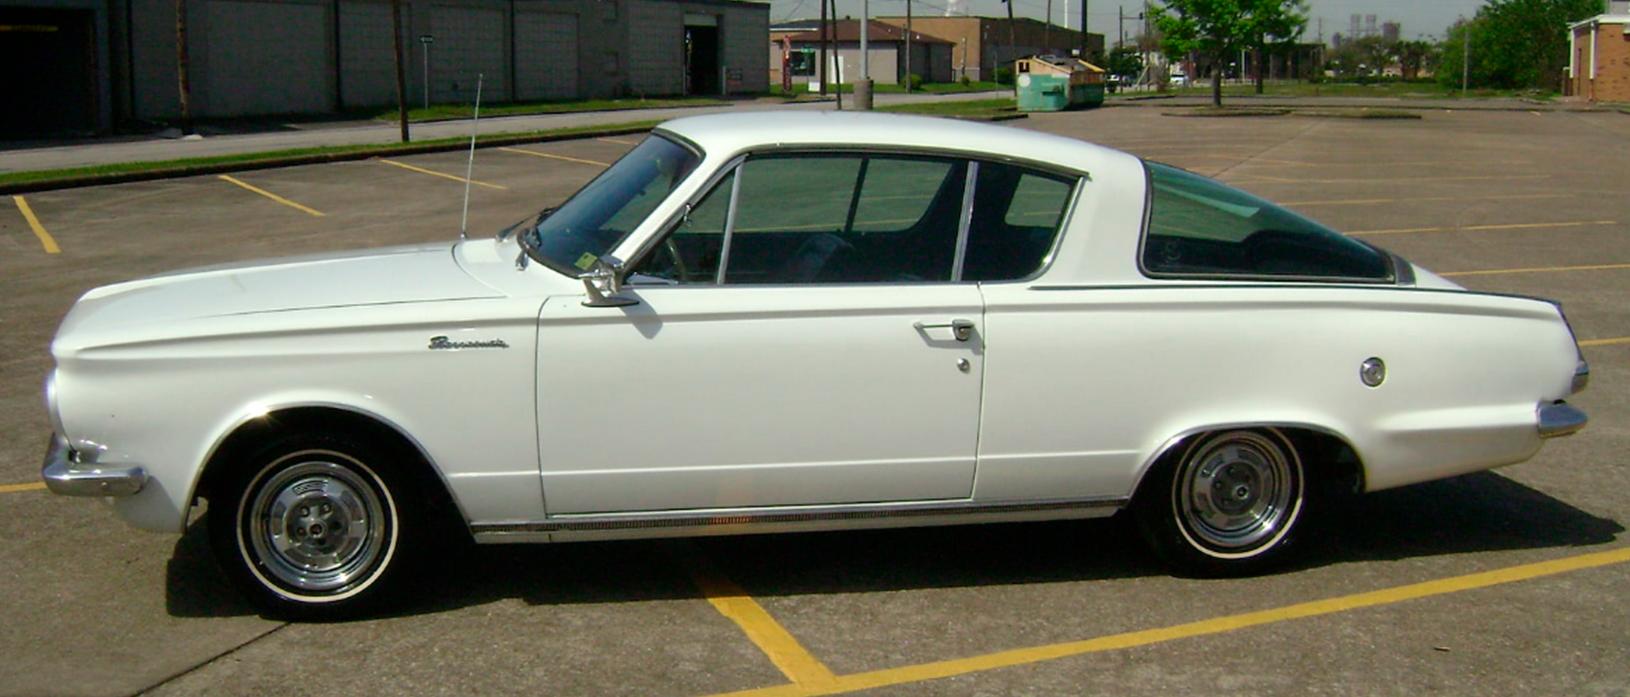 White 1965 Plymouth Barracuda